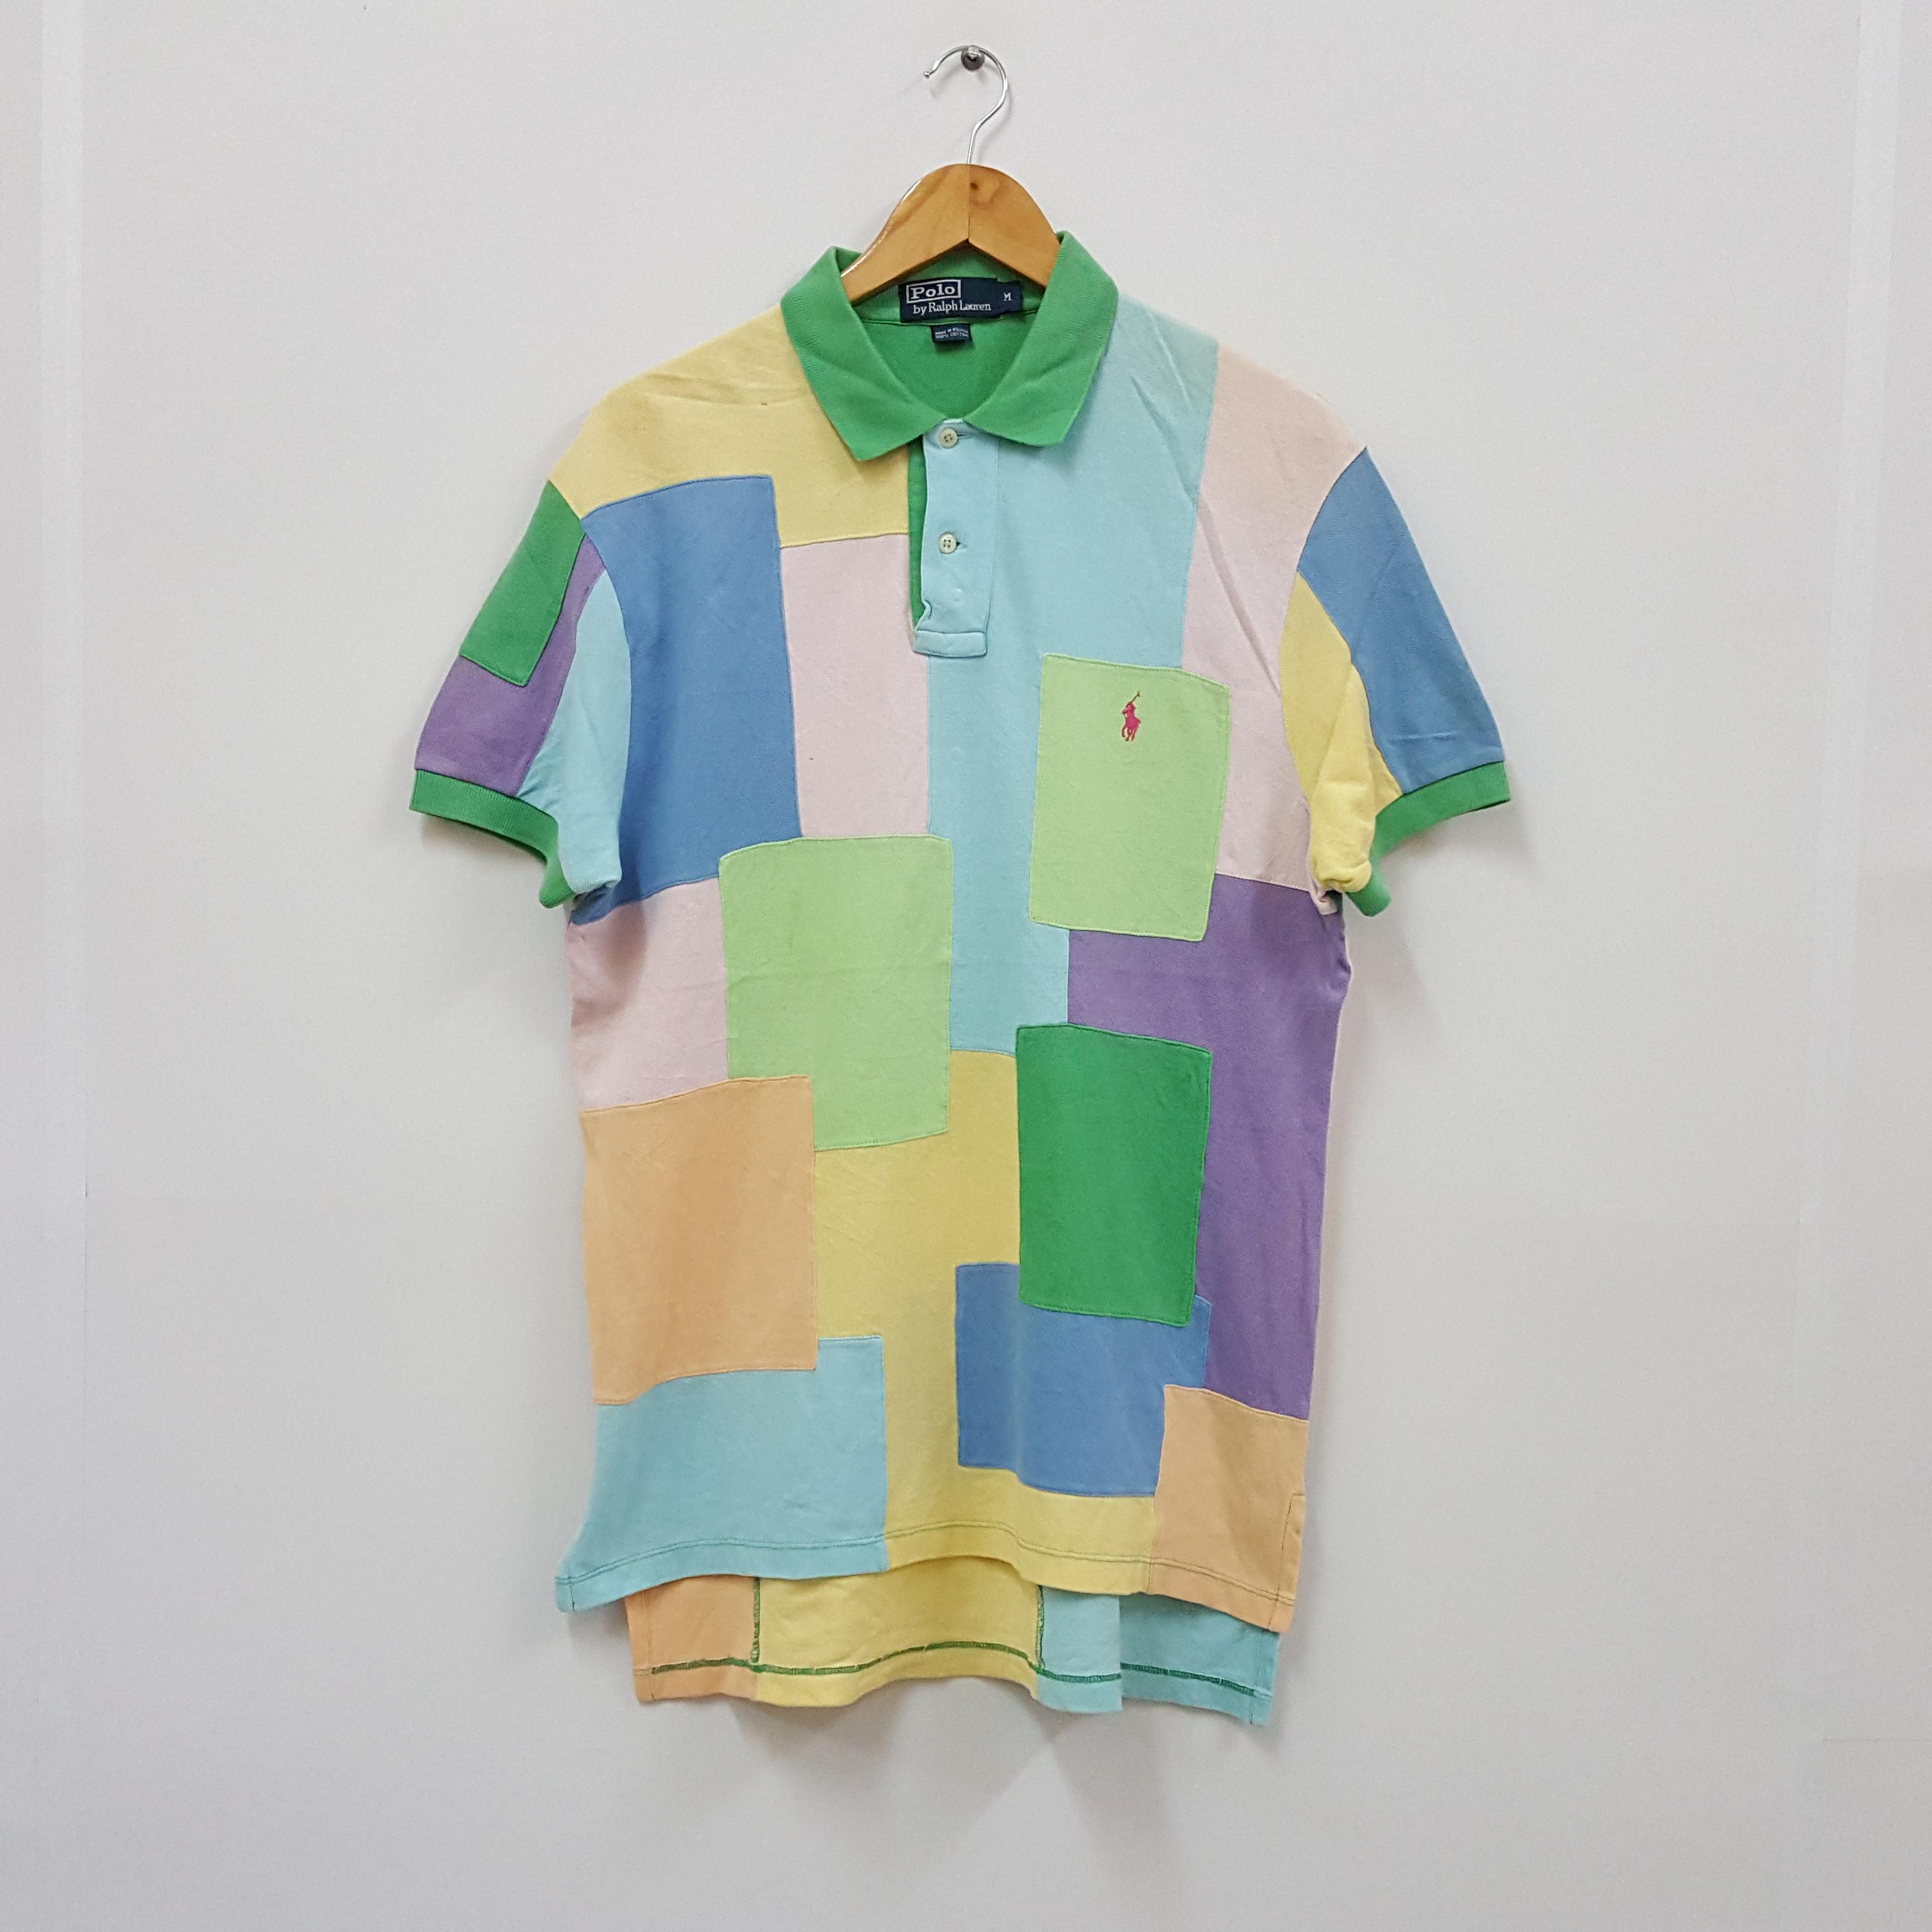 Nice Shirt Vintage Lauren Polo Design By Ralph 92bIYeHWED